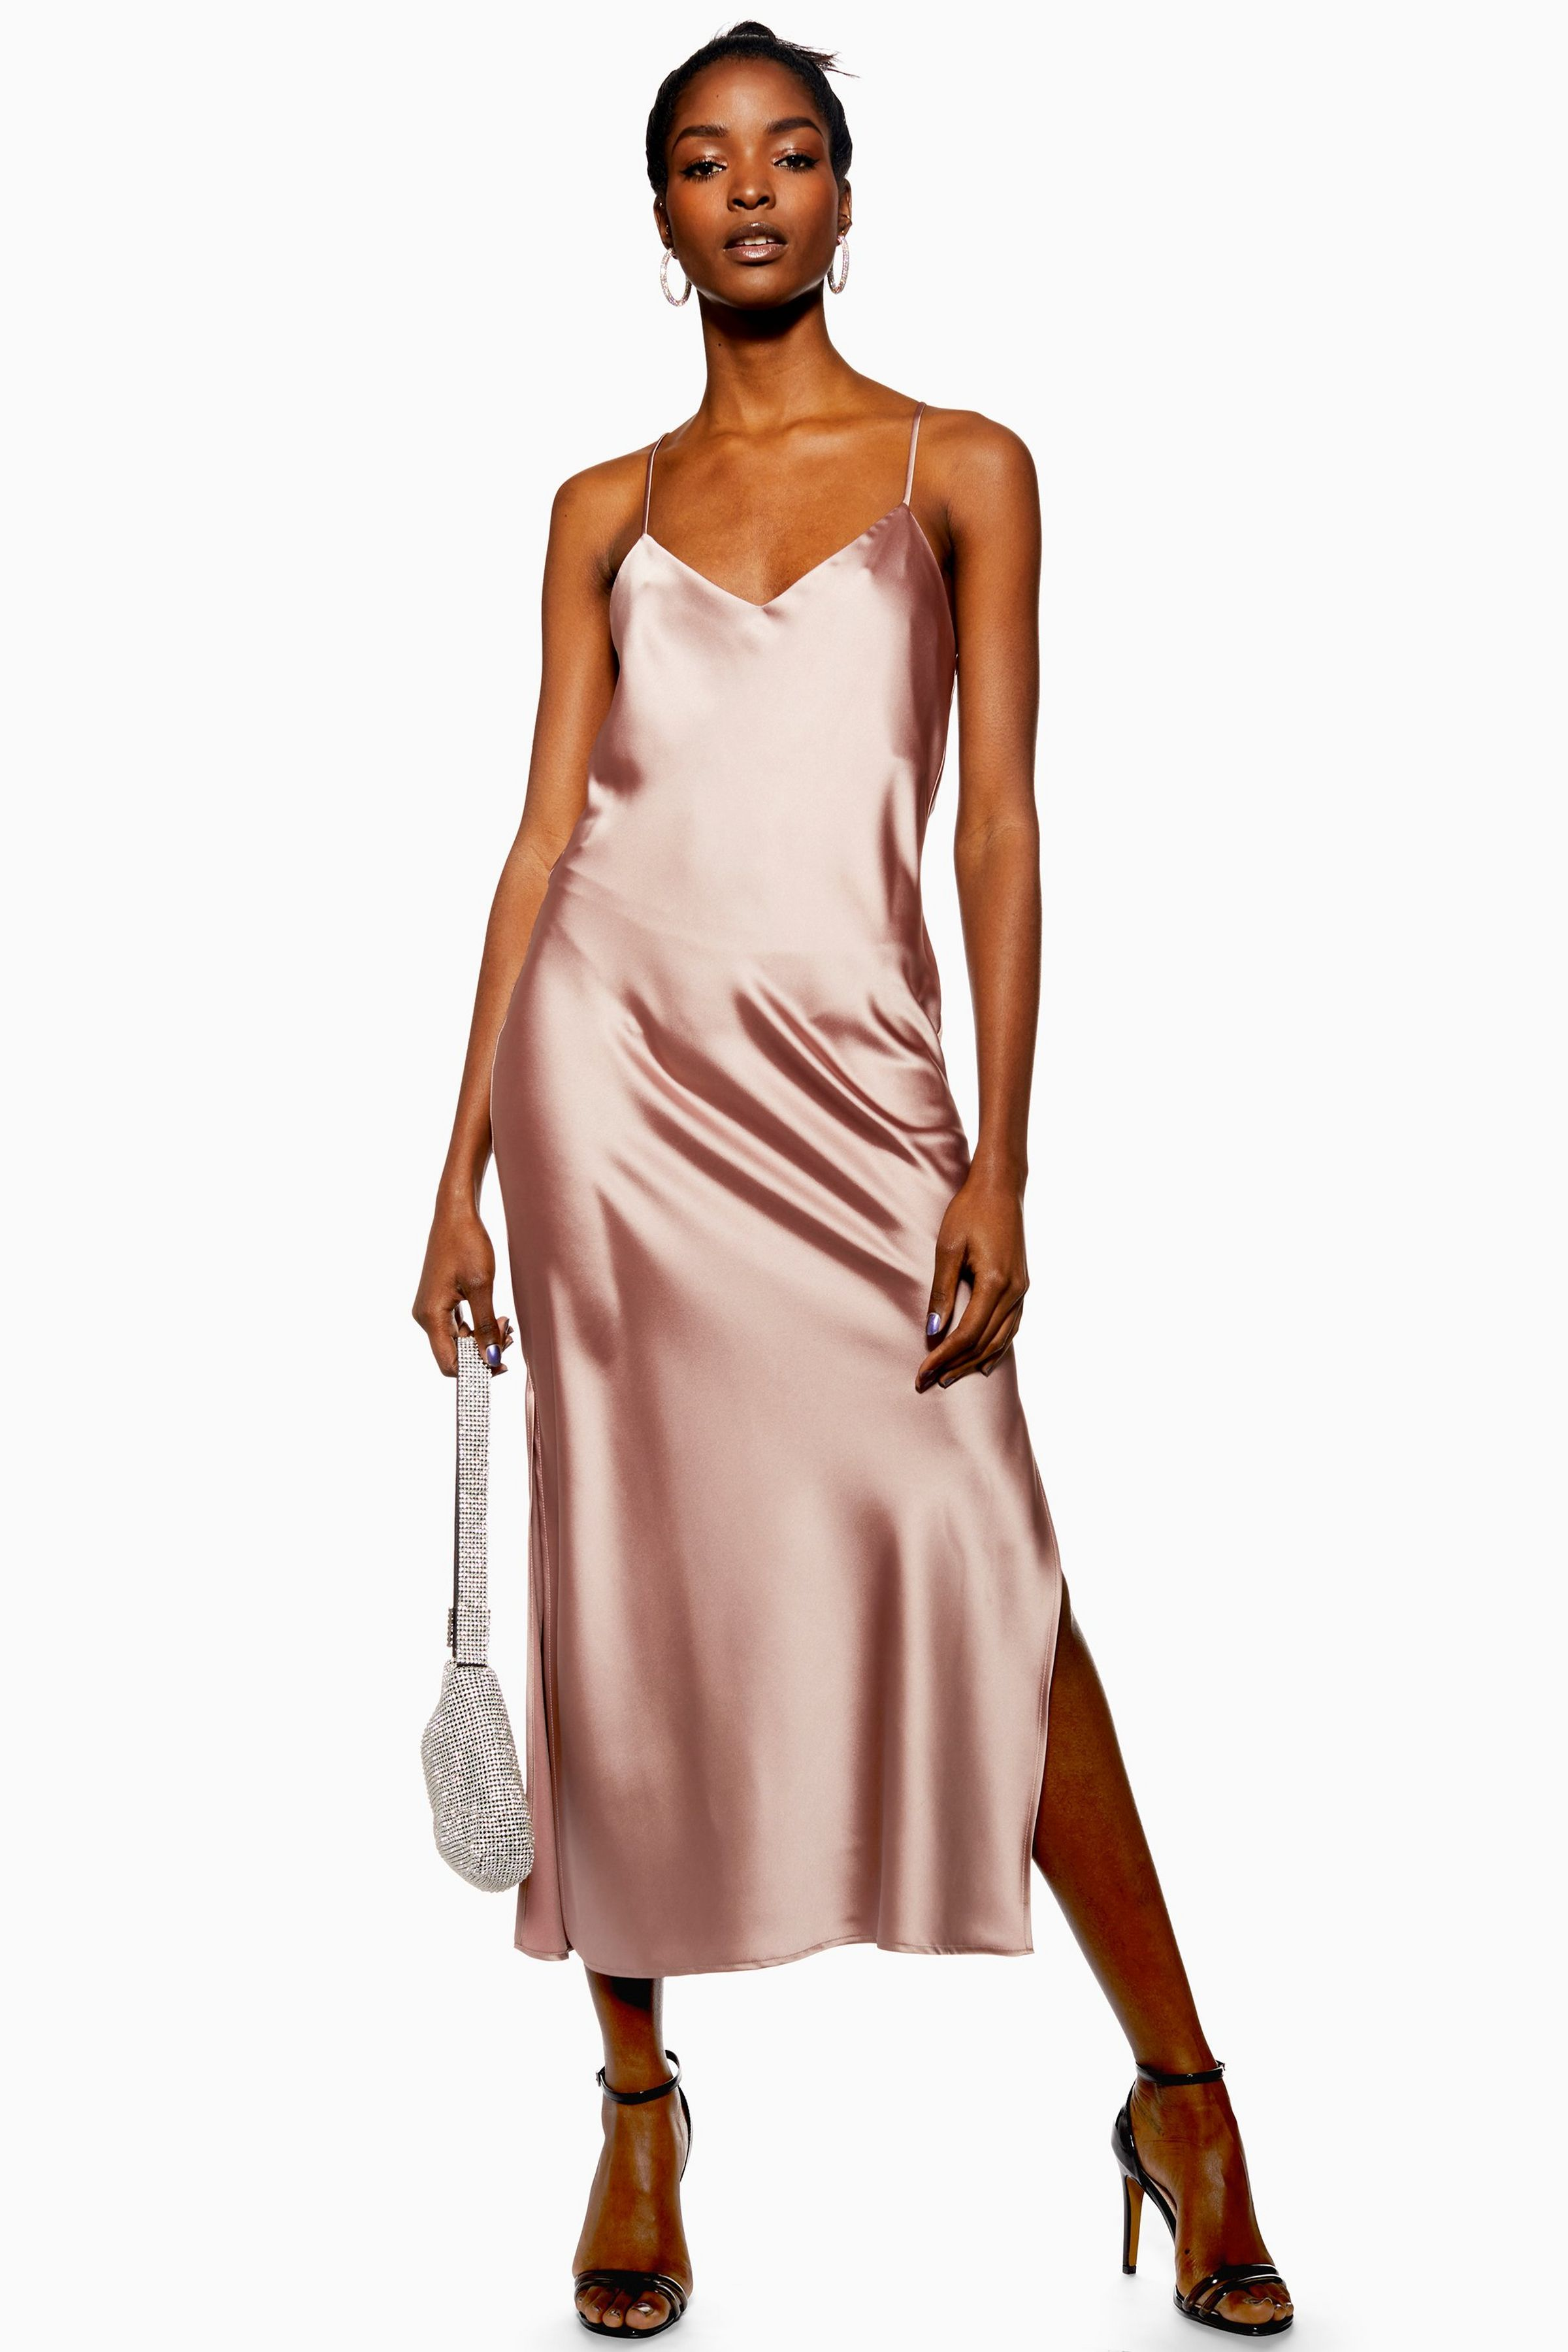 Carousel image 0 slip dress satin slip dress top shop